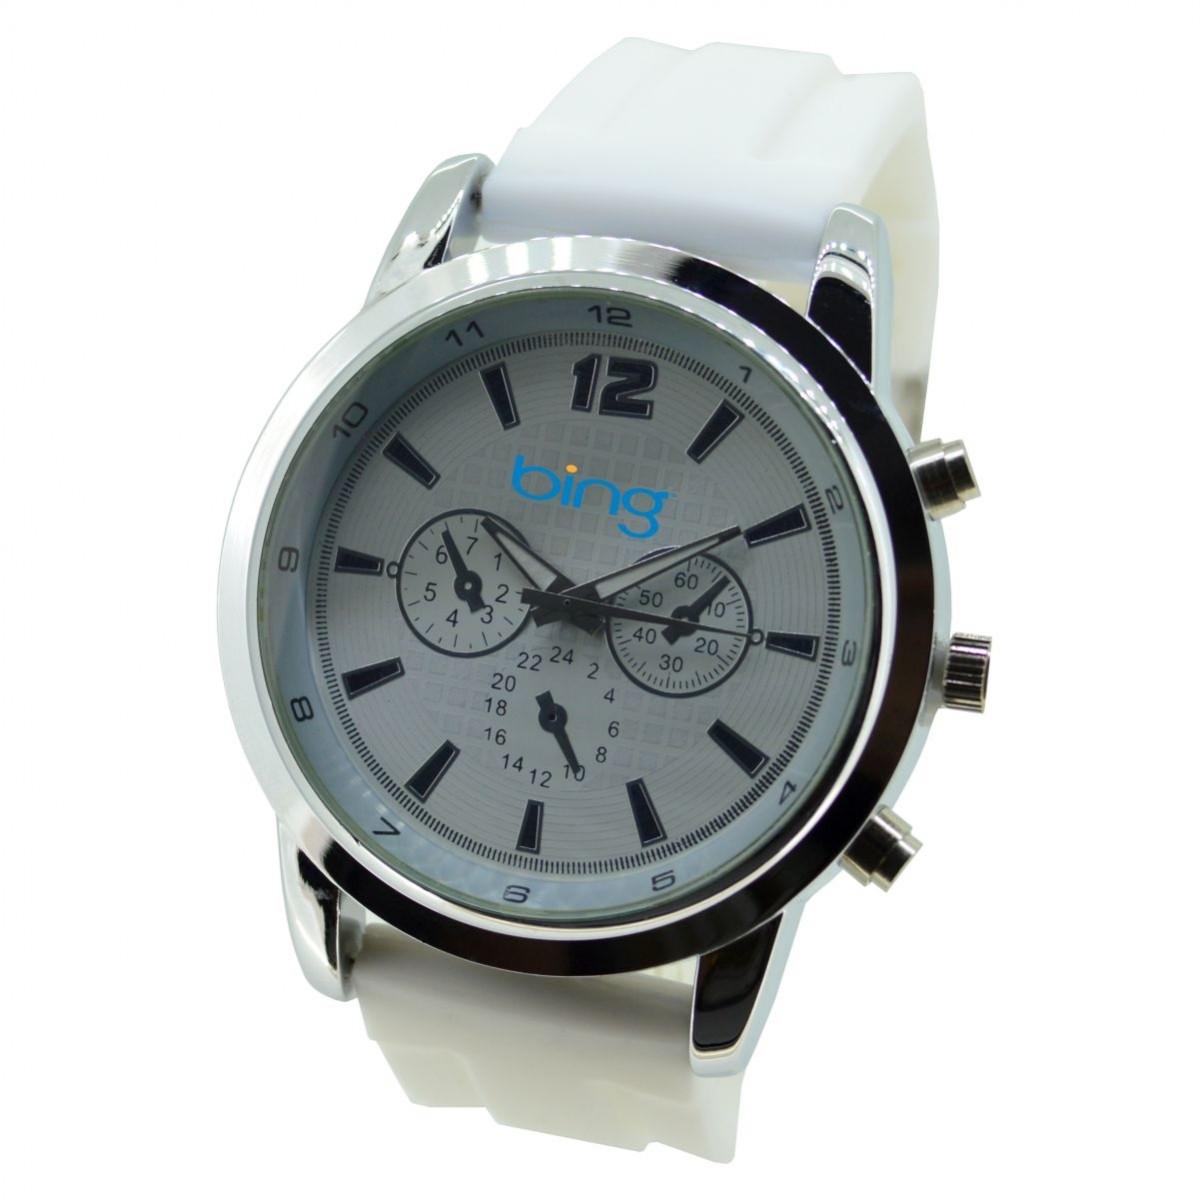 Relógio Personalizado 2477-2